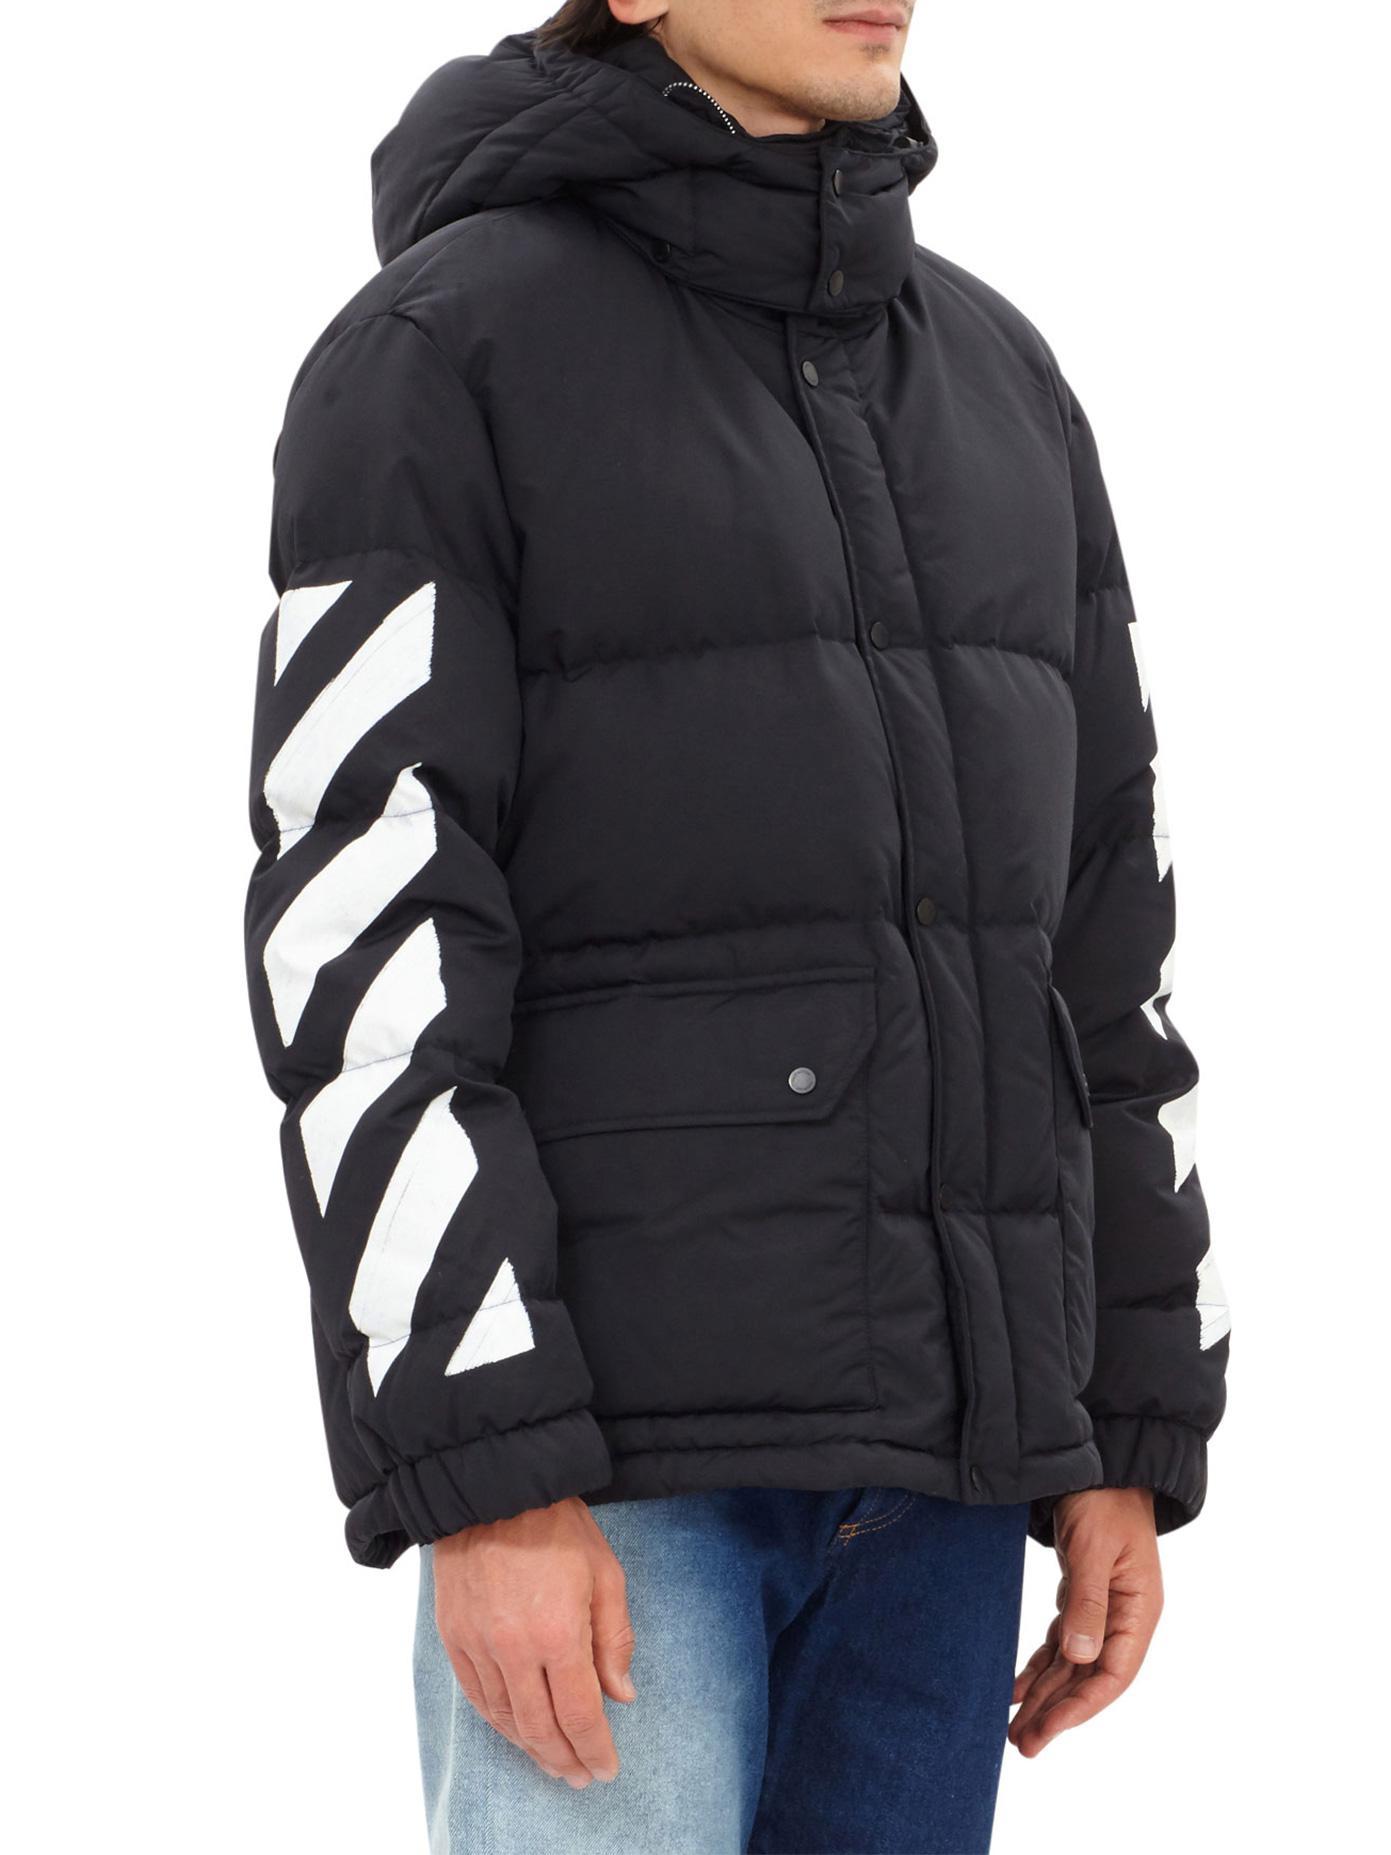 Off-White c/o Virgil Abloh Diag Brushed Nylon Down Jacket ...